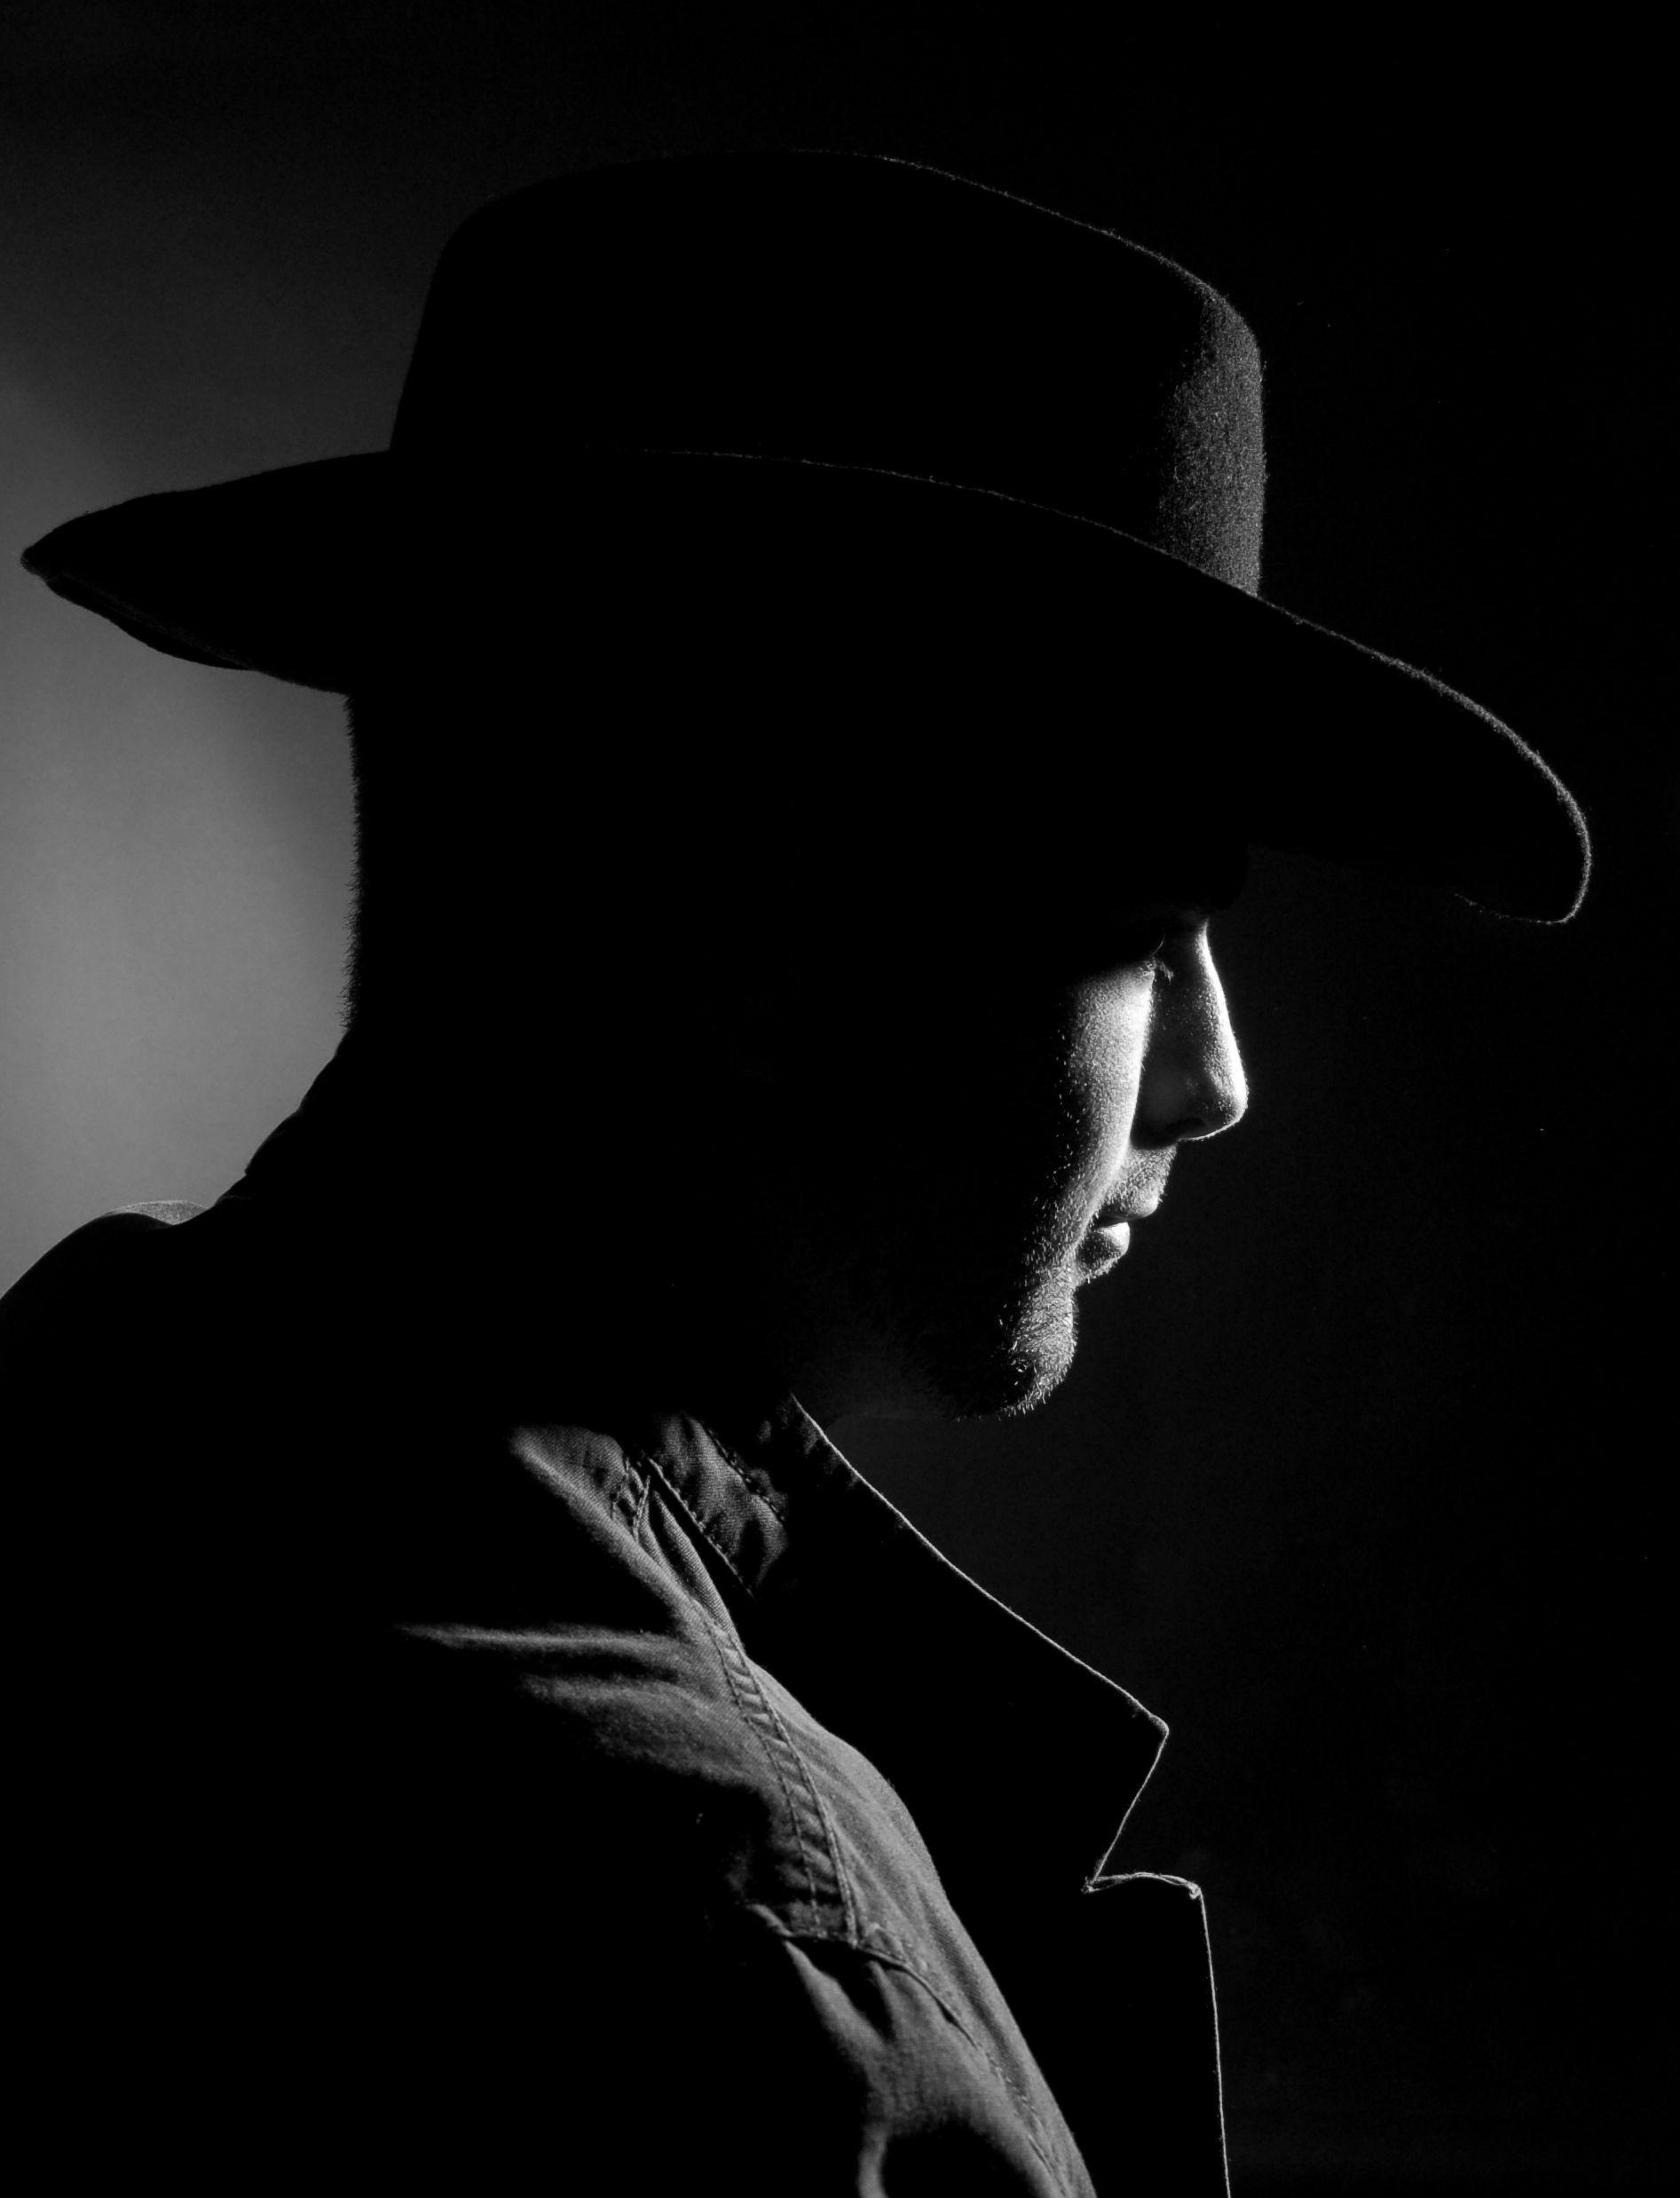 Black and white studio photography when it comes to studio